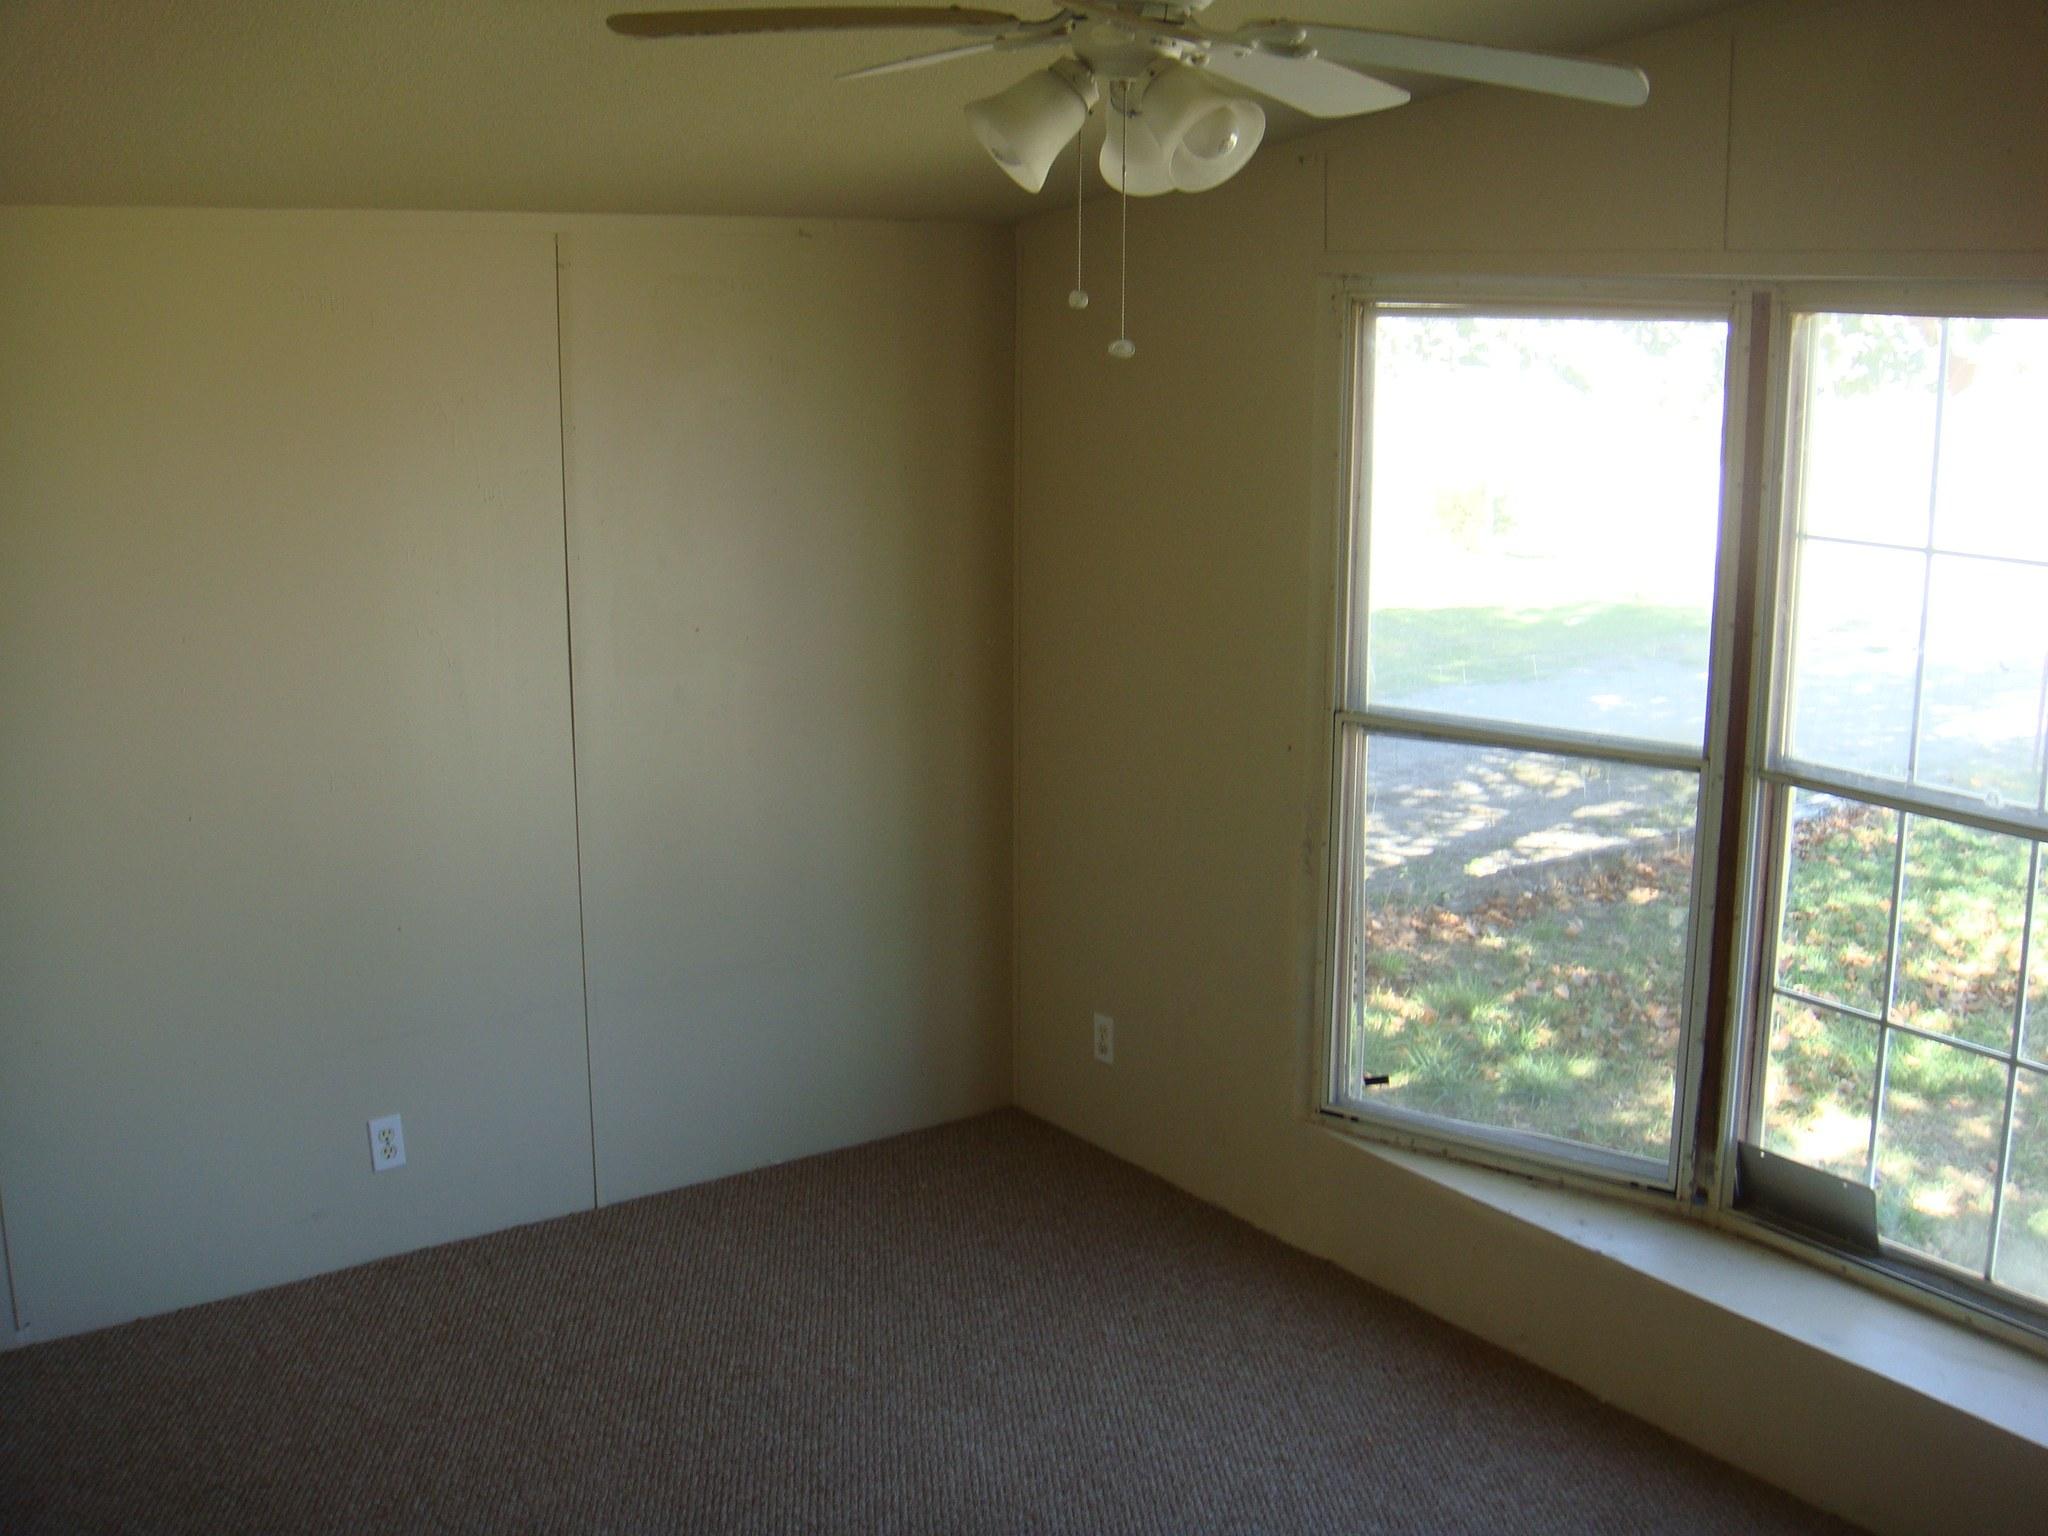 562 Front Bedroom small.jpg